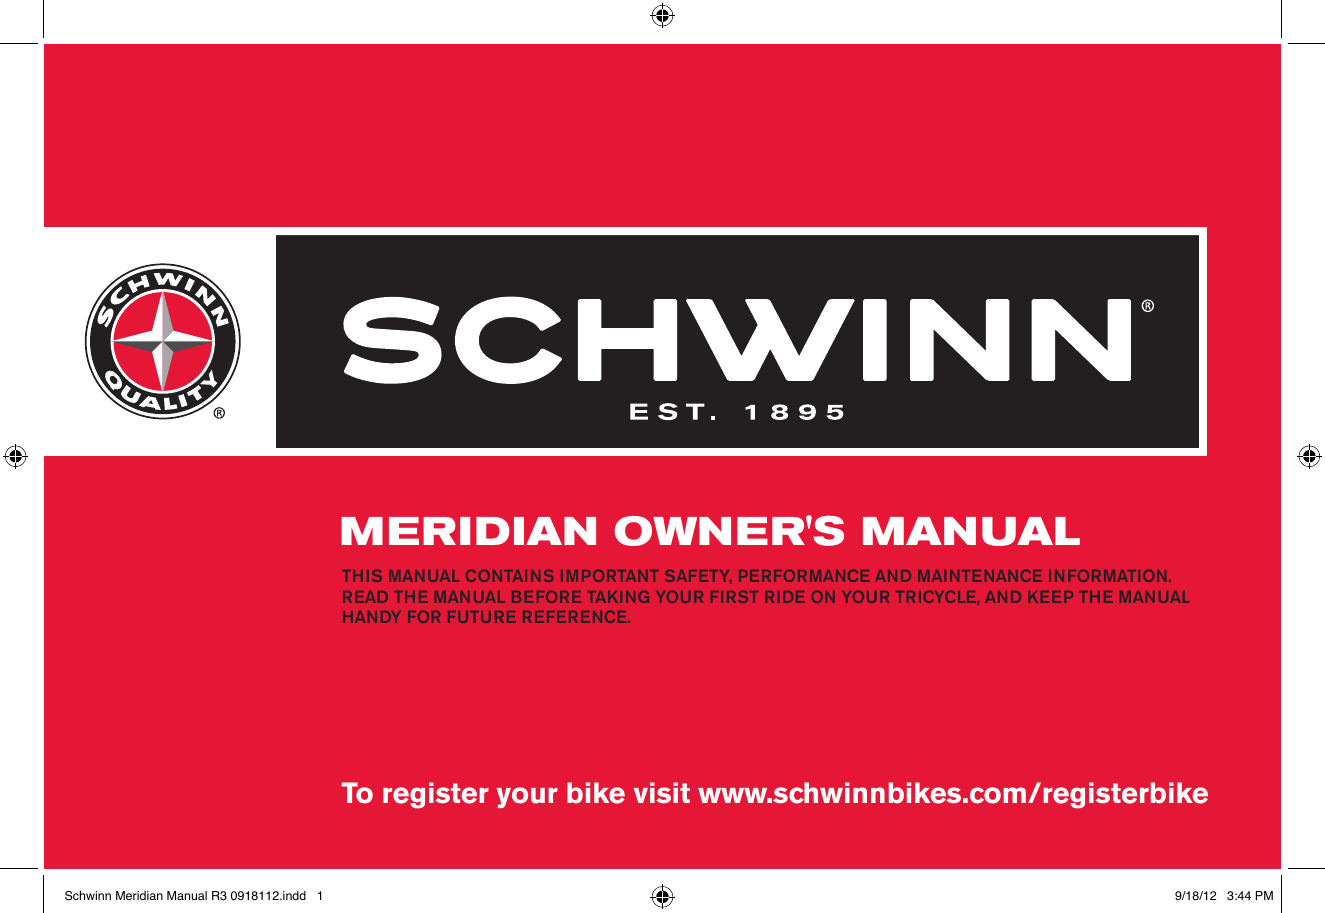 Schwinn Updated 2012 Meridian Owners Manual 50cc Wiring Diagram